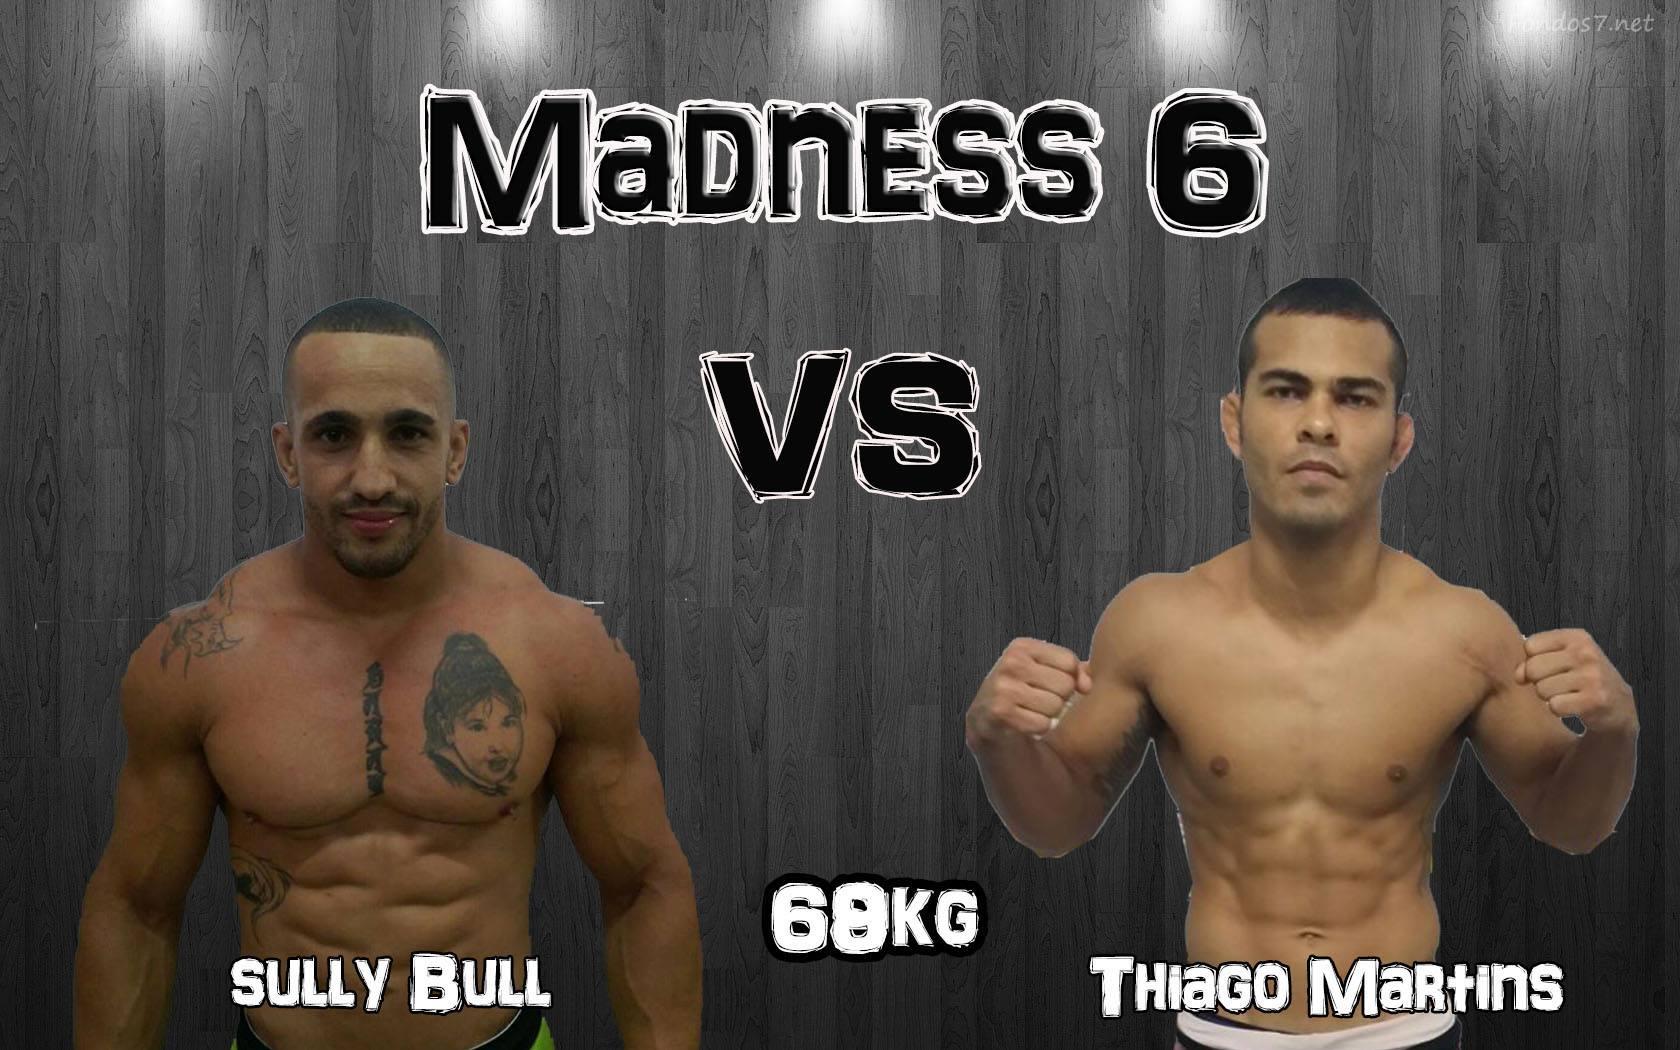 Sully Bull vs Thiago Martins